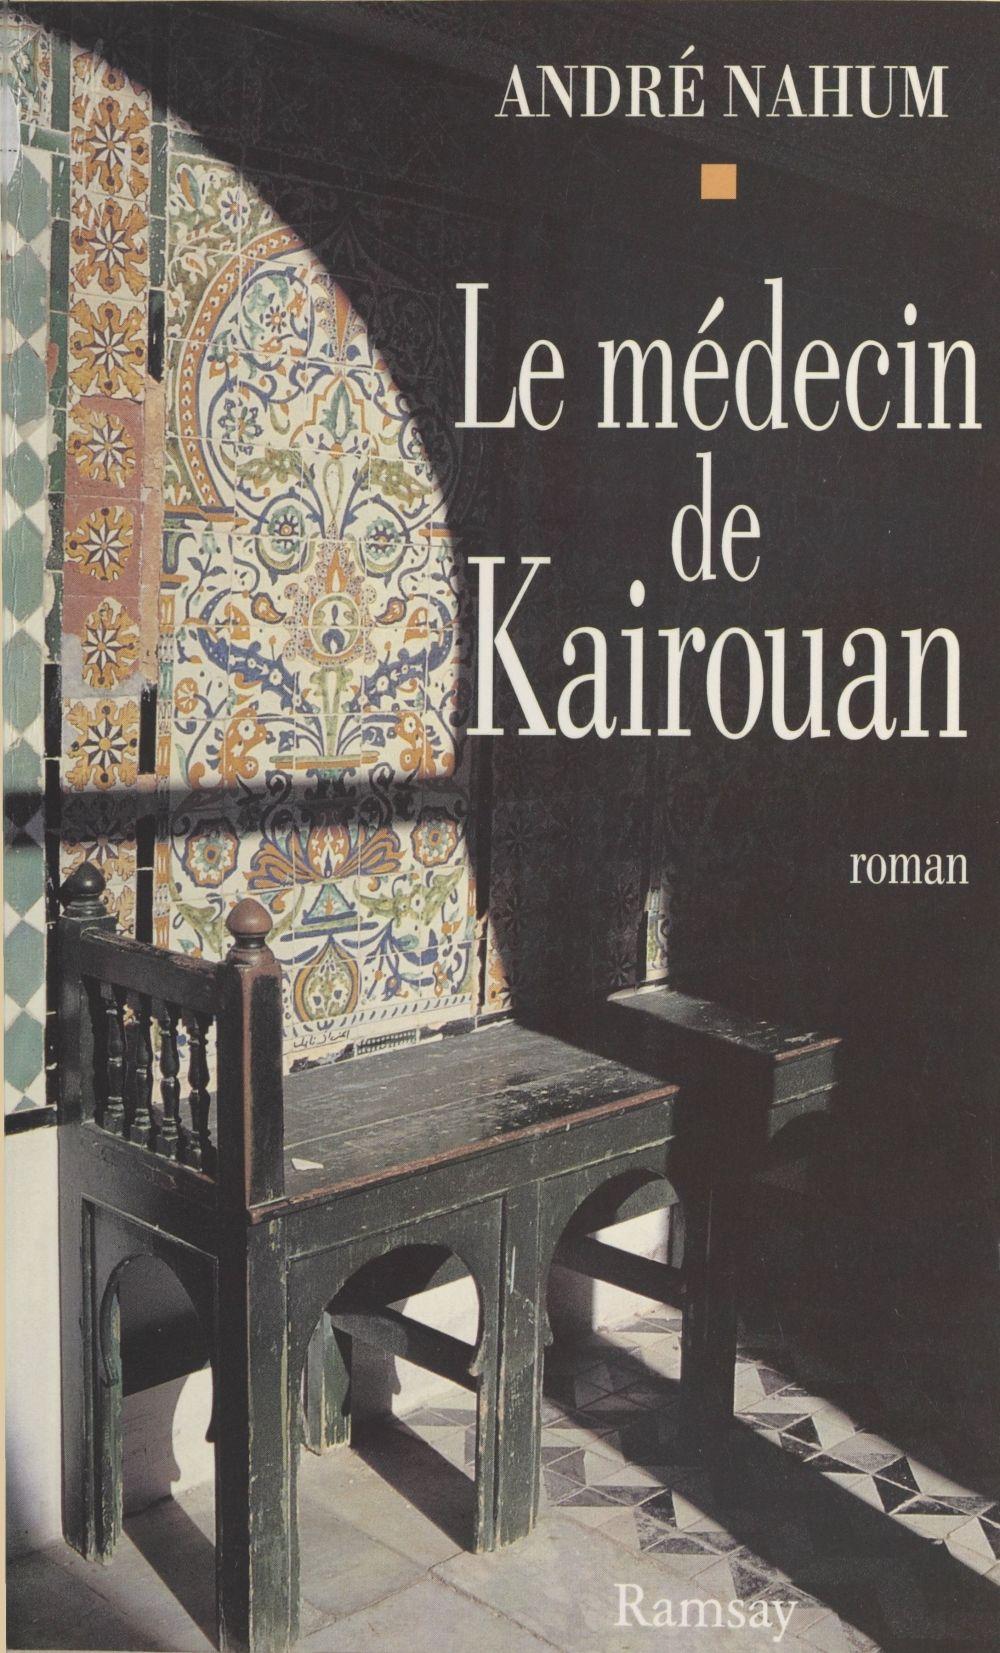 Le medecin de kairouan